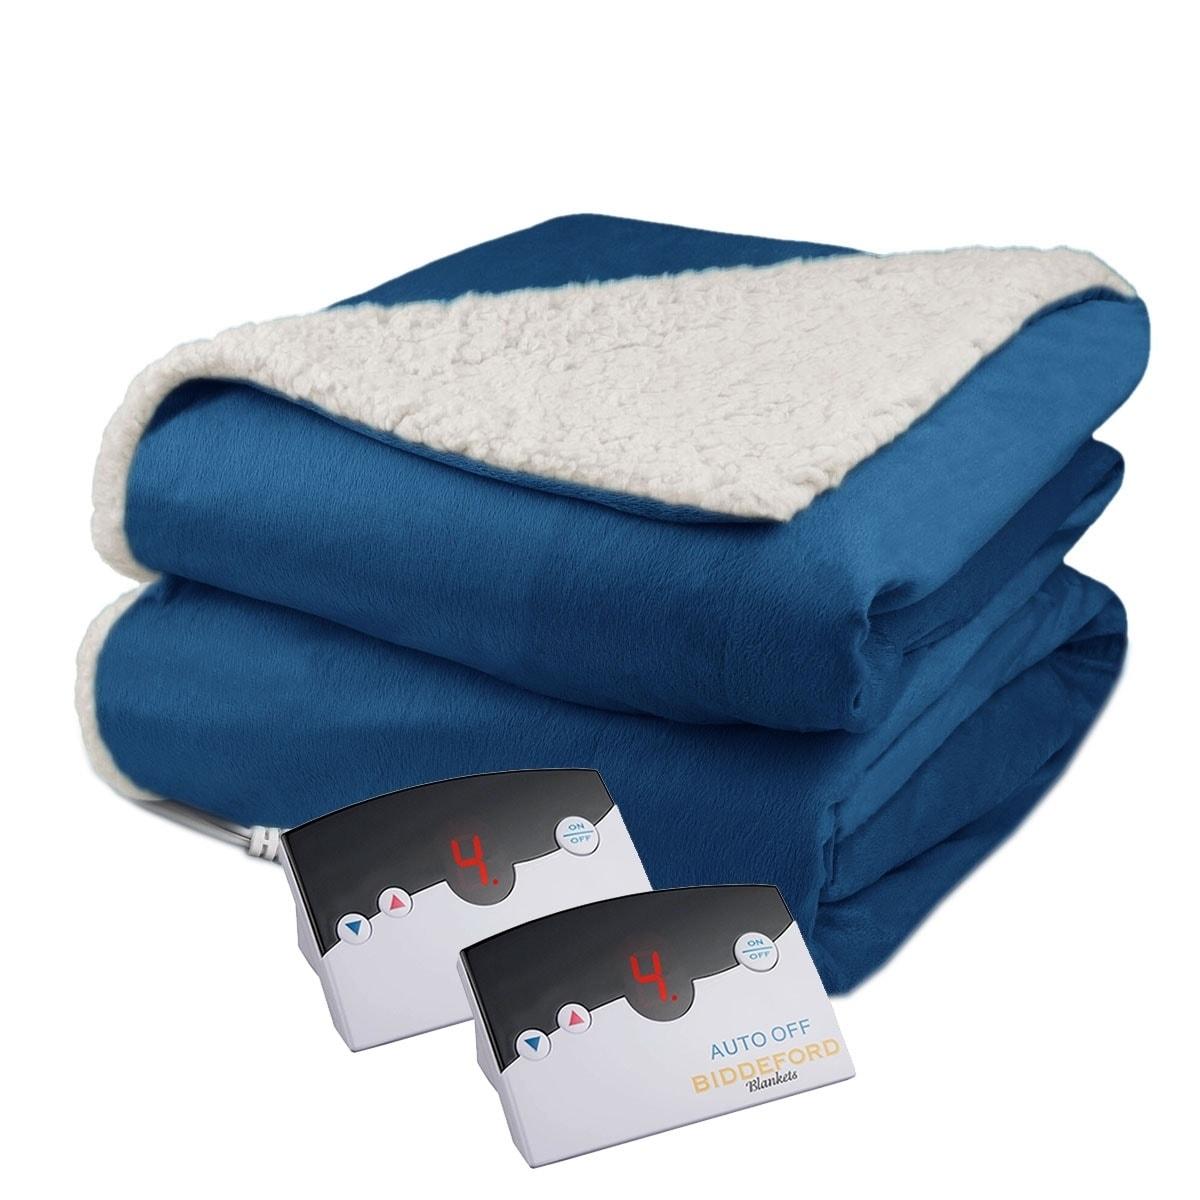 Brick Red Biddeford Soft Velour /& Sherpa Electric Heated Throw Blanket 13/' Cord